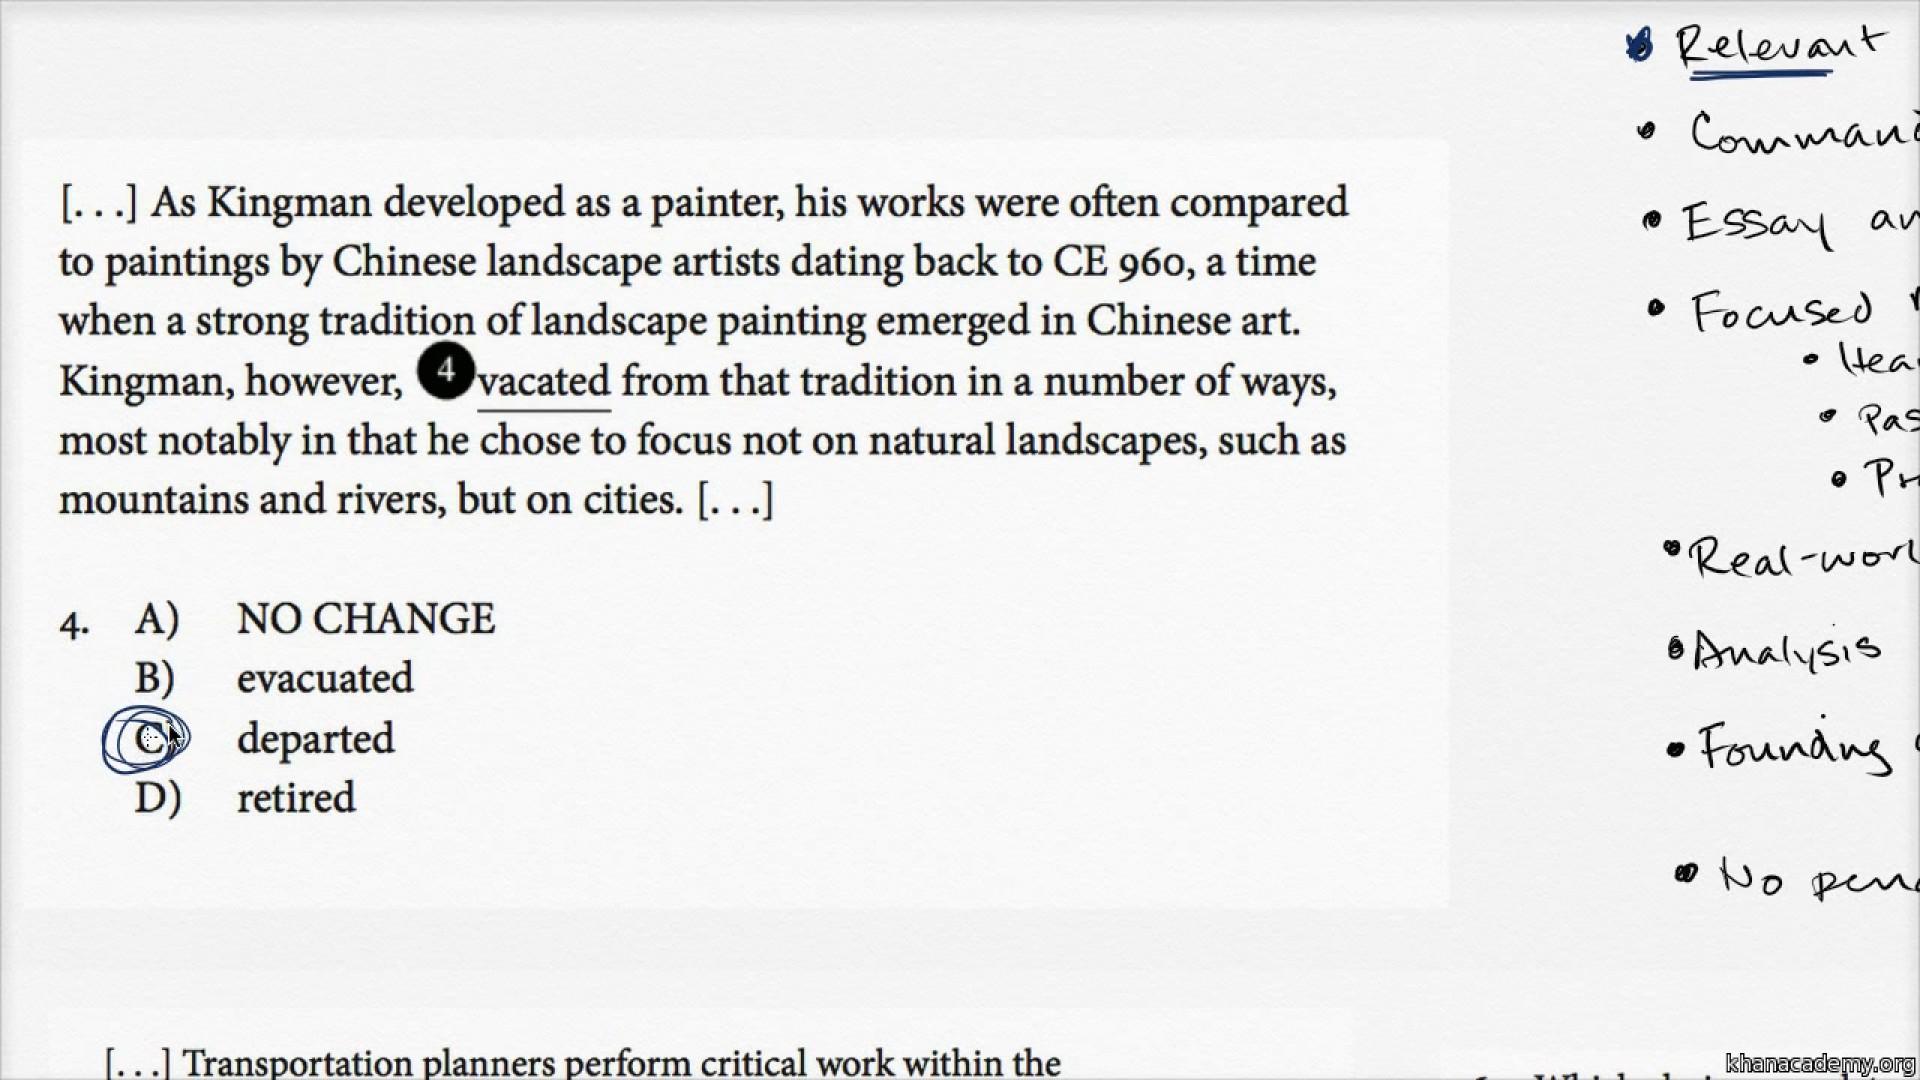 014 Rxjrhbs 21c Essay Example Sat Exceptional Practice Sample Jimmy Carter Test 1 8 1920